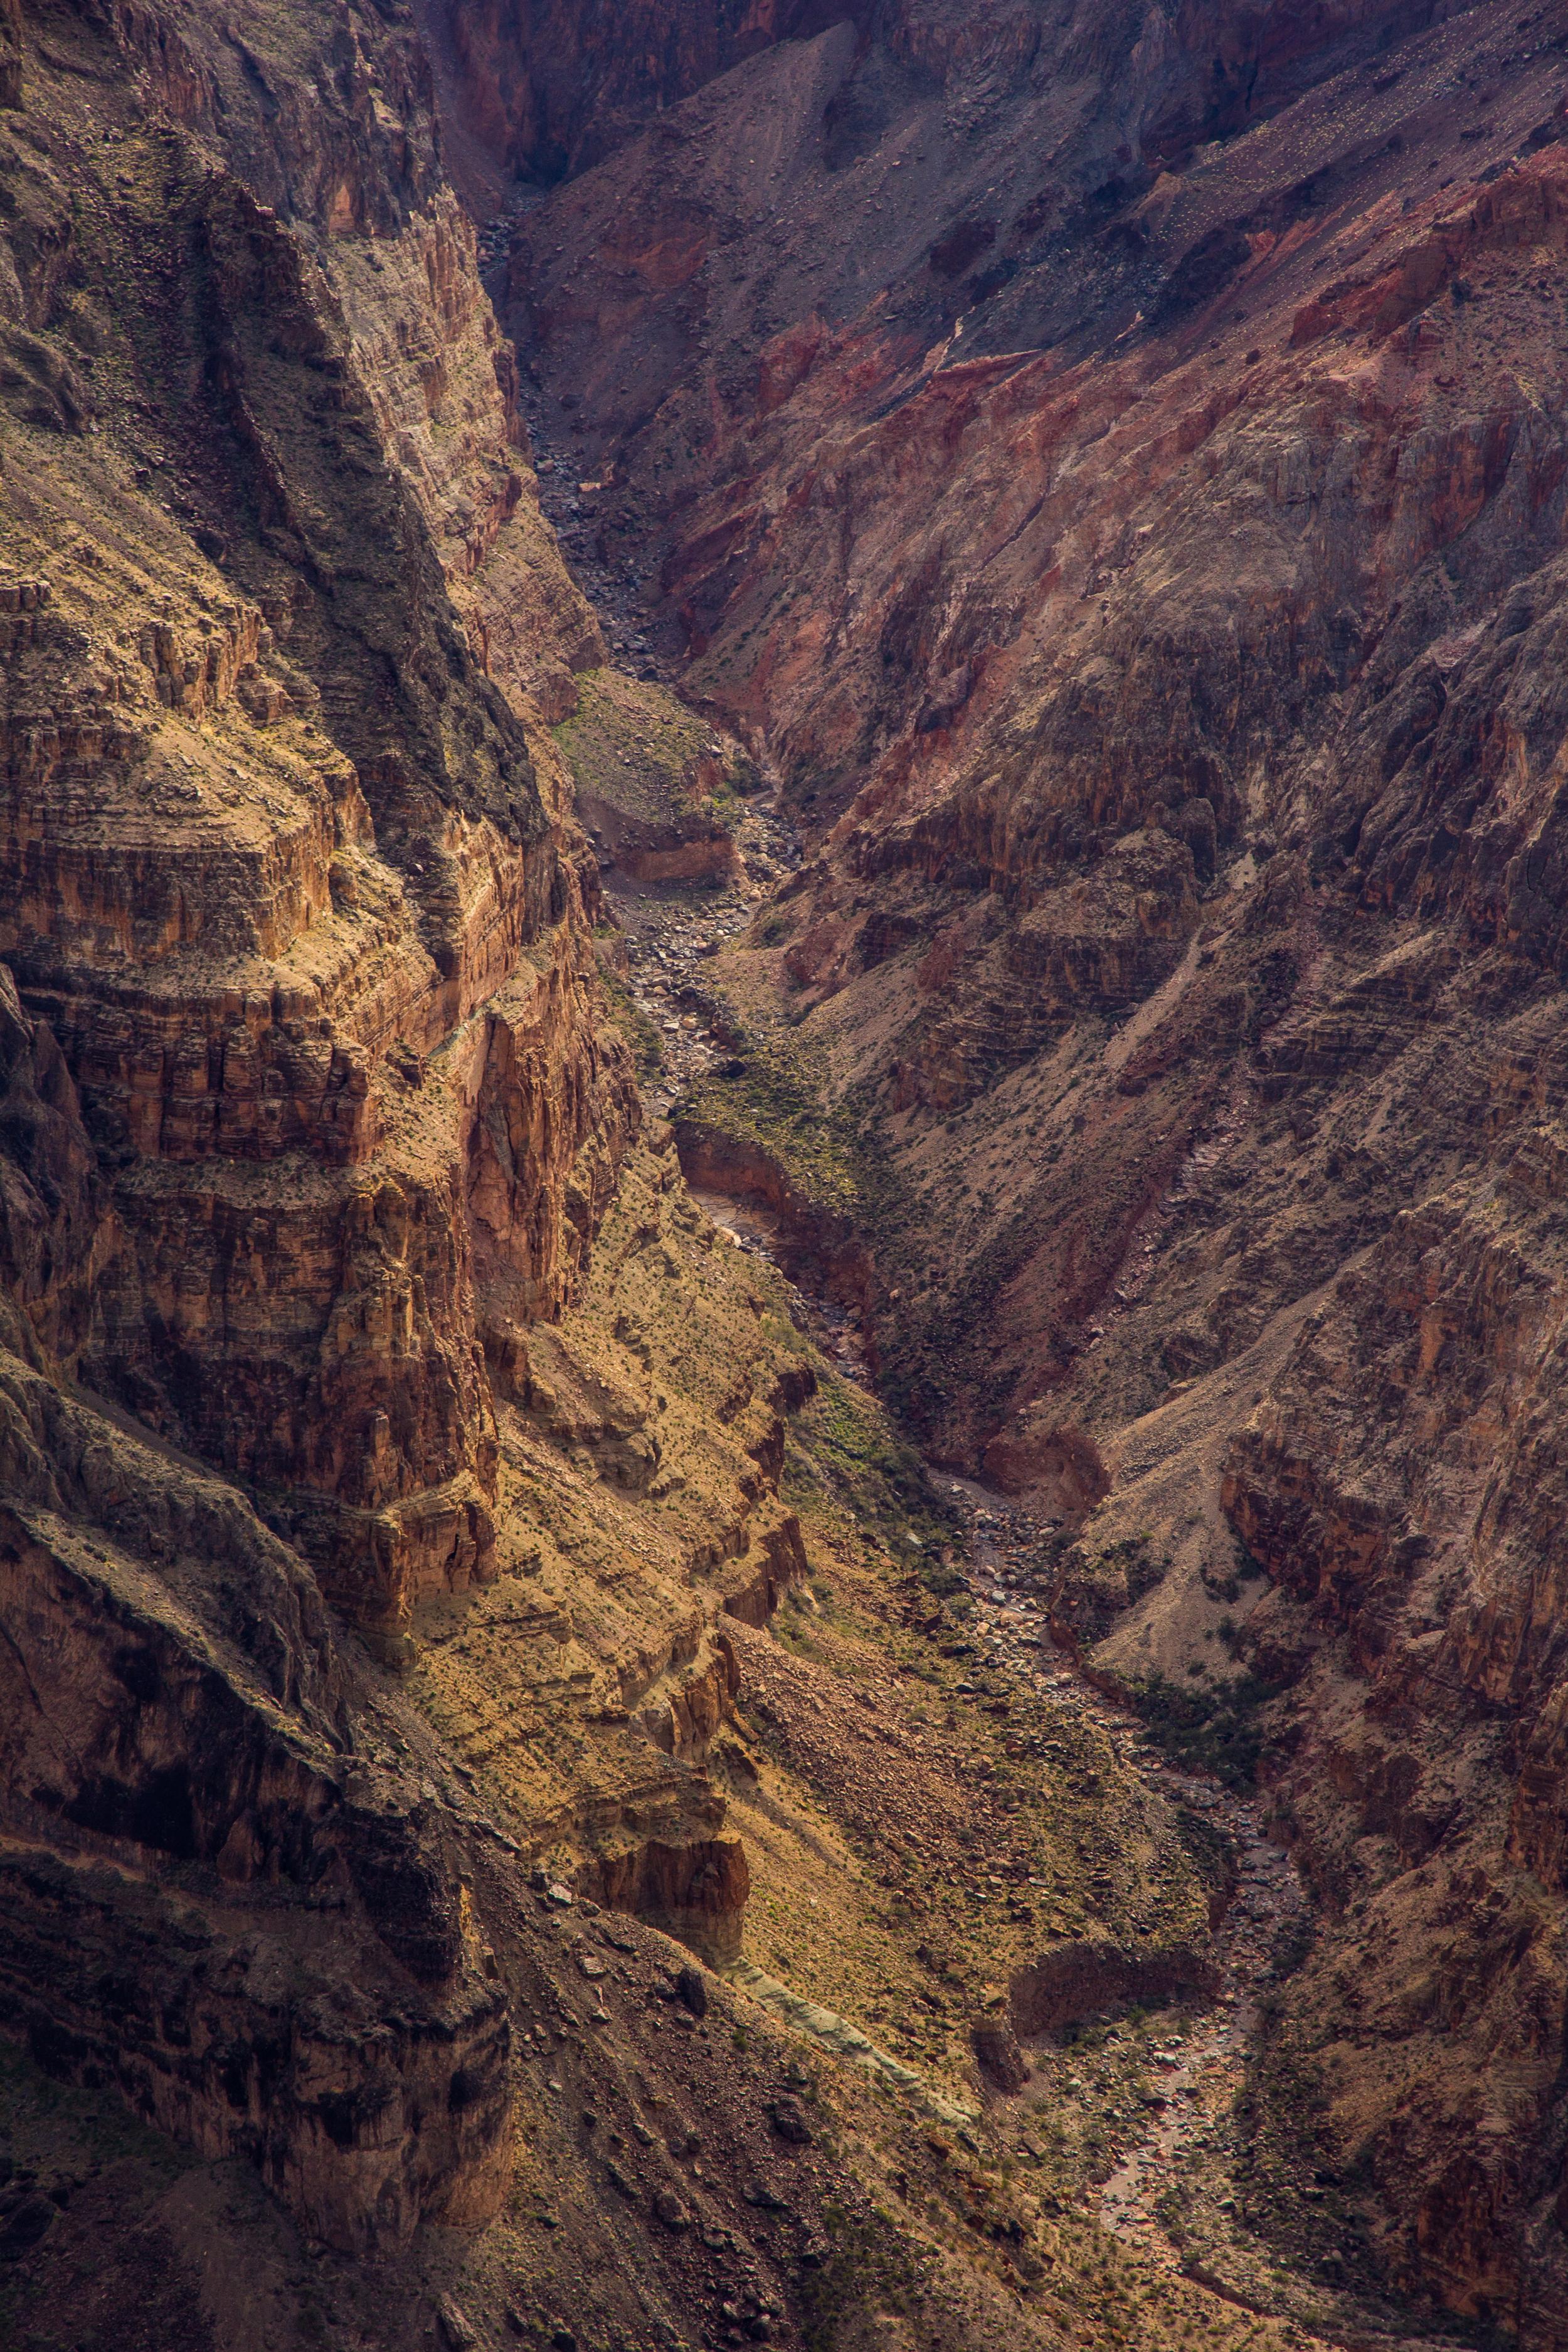 Prospect Canyon. Grand Canyon, AZ